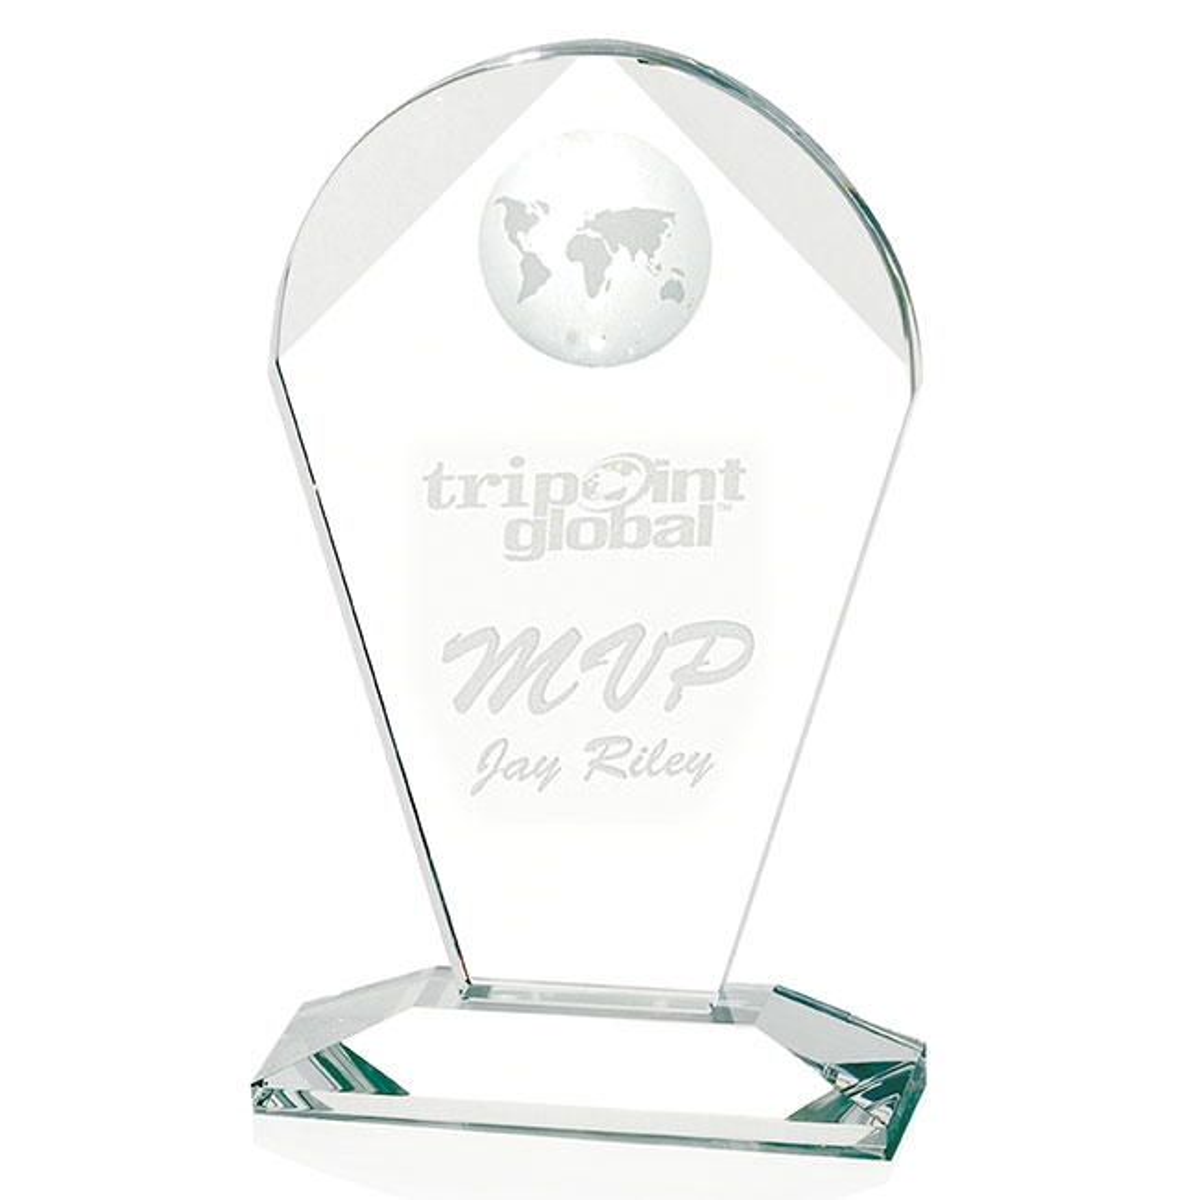 Jaffa Geodesic Large Award - Deep Etch Imprint, #35074